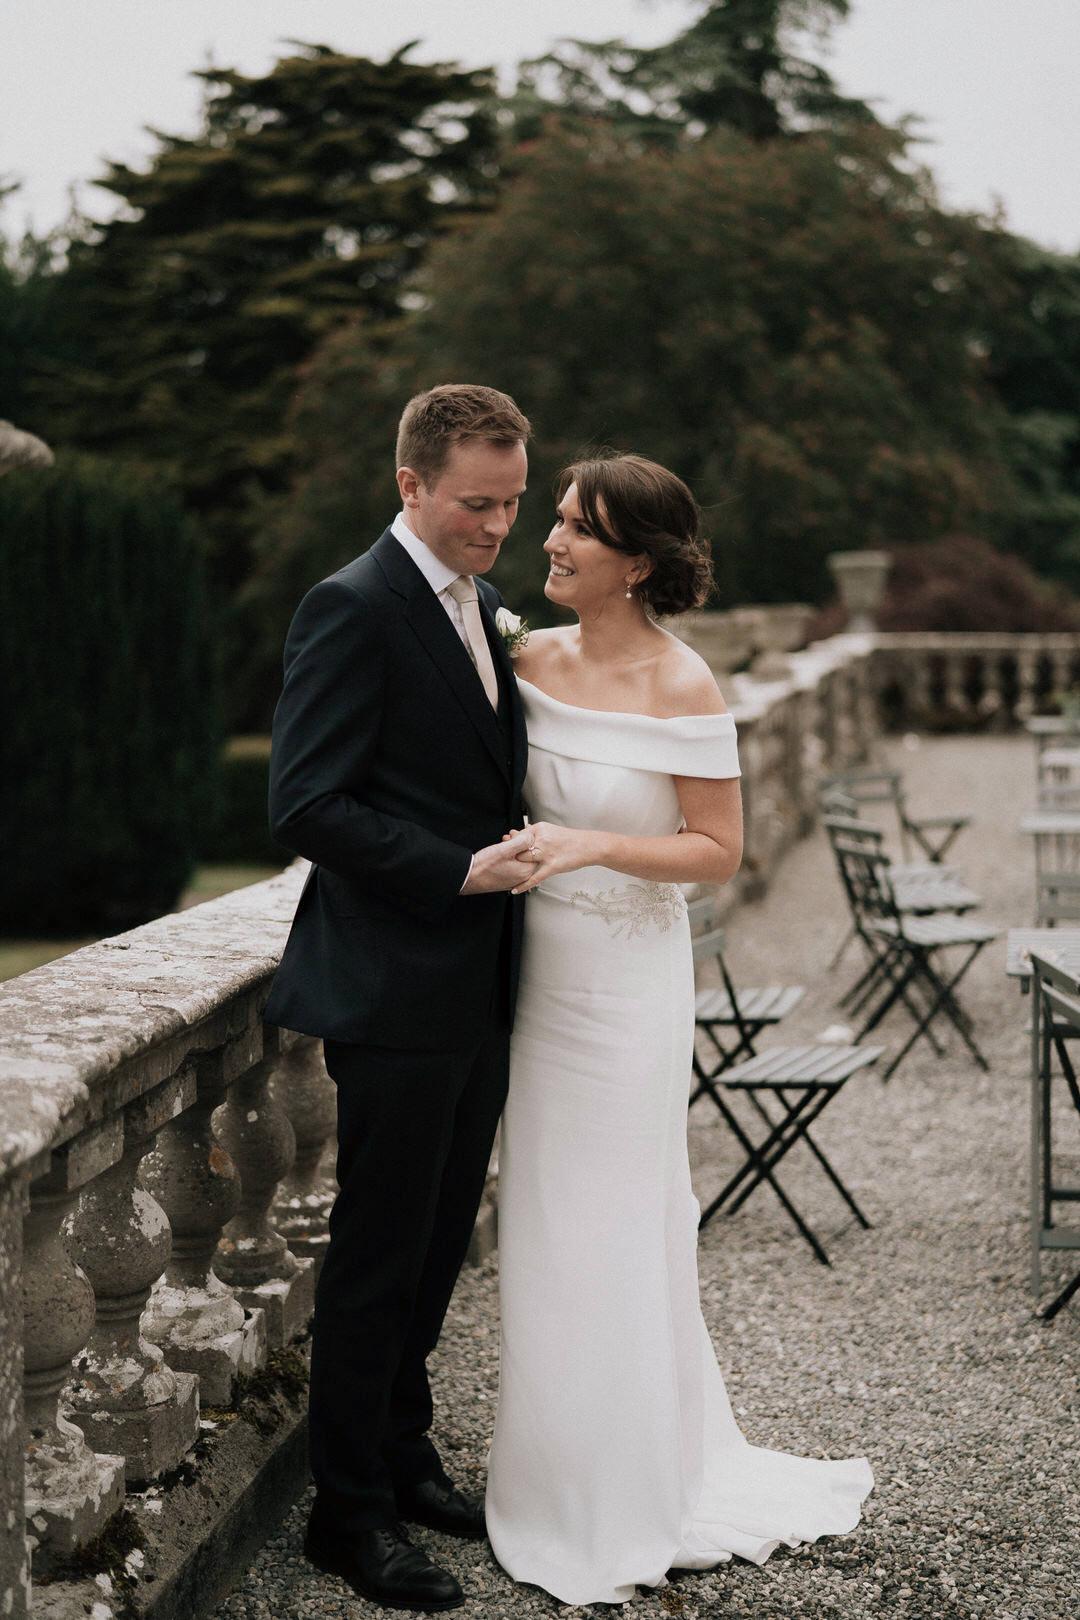 Gloster-House-wedding-photos13 13